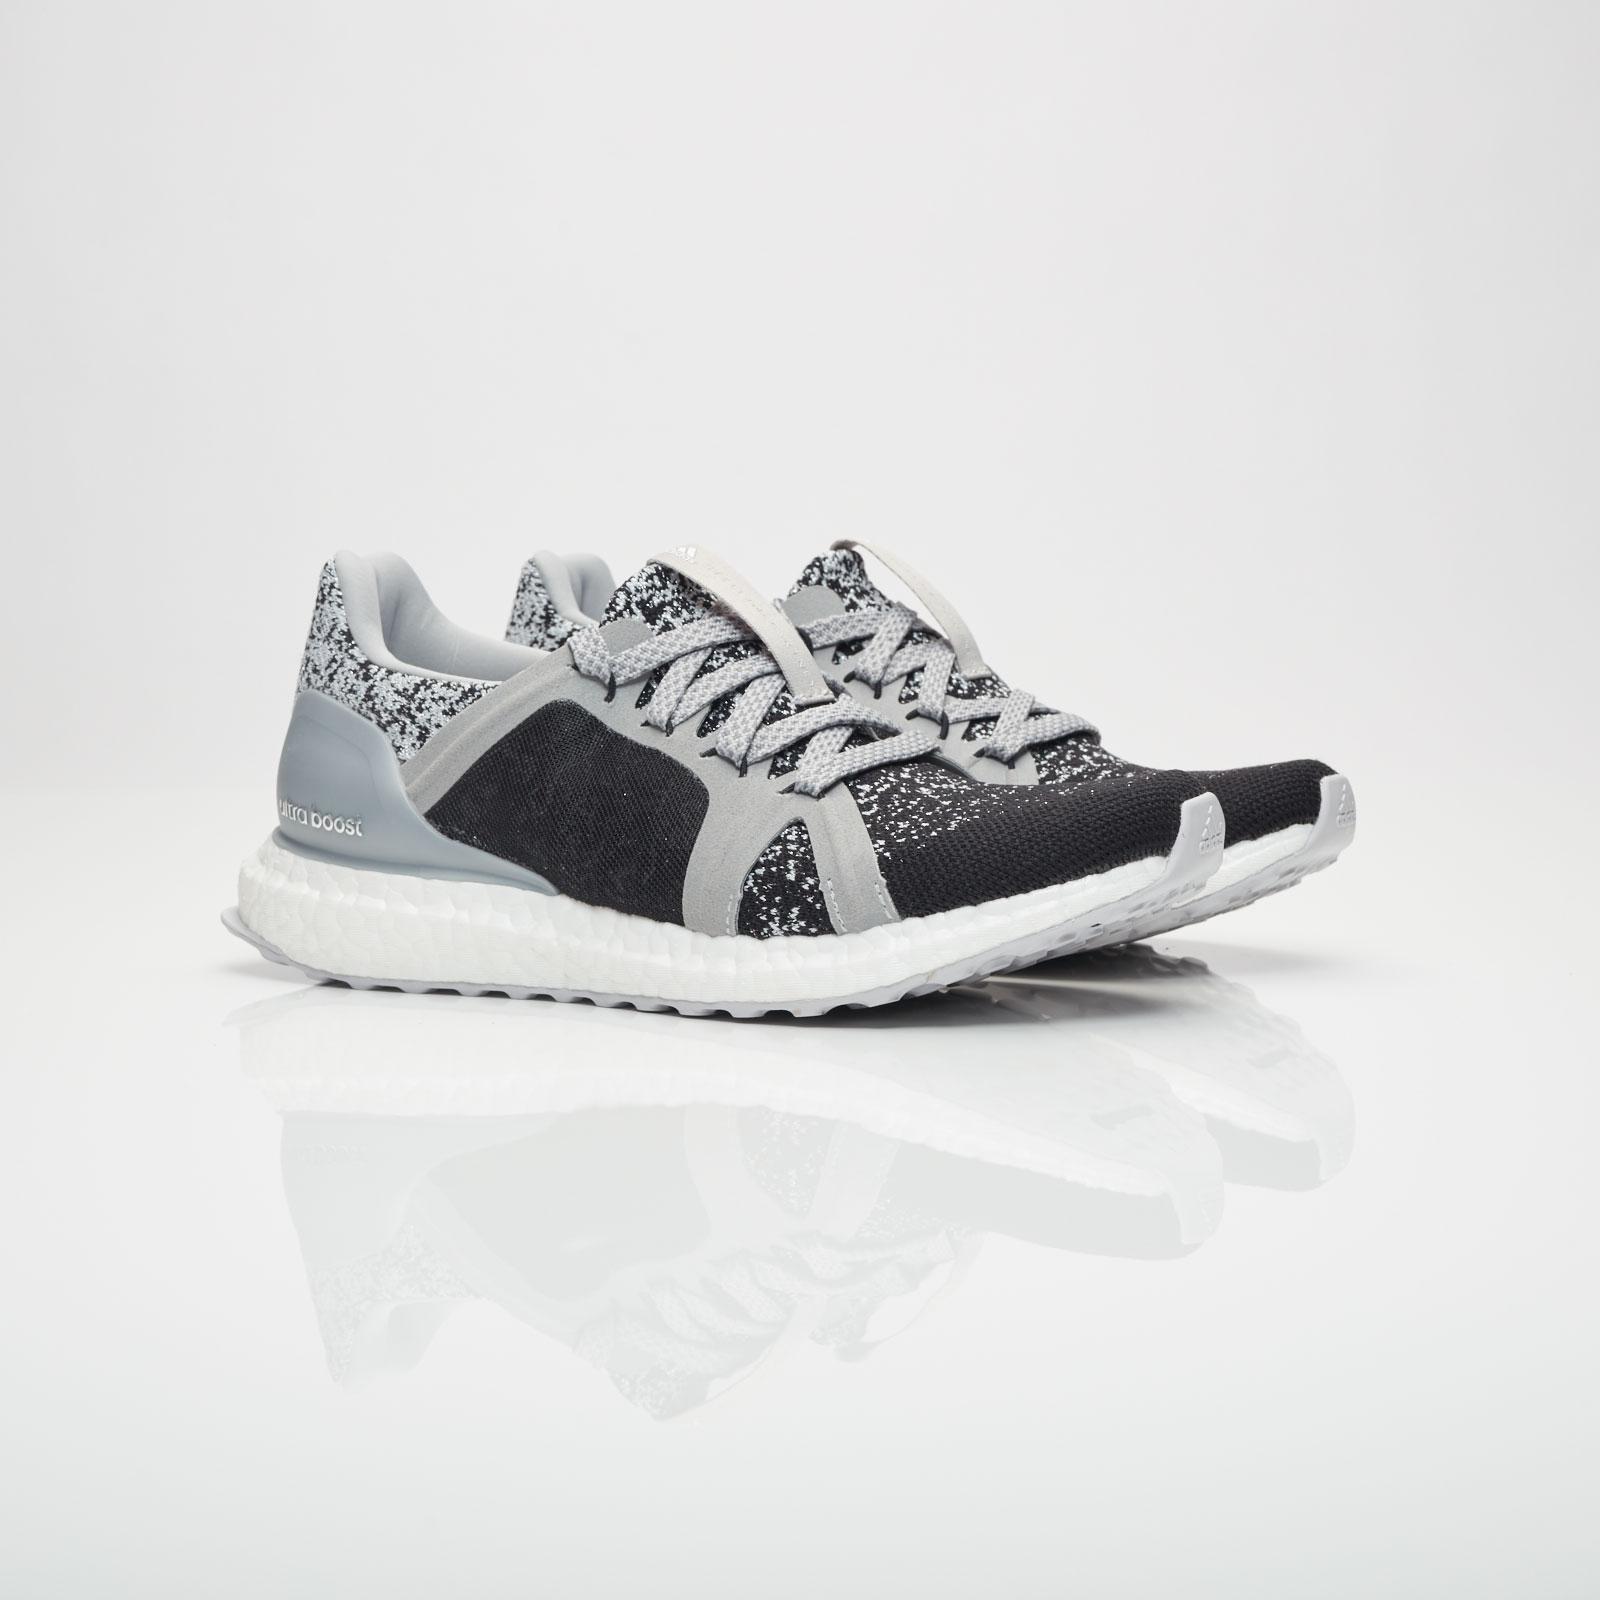 d02d20869 adidas UltraBOOST - S80846 - Sneakersnstuff